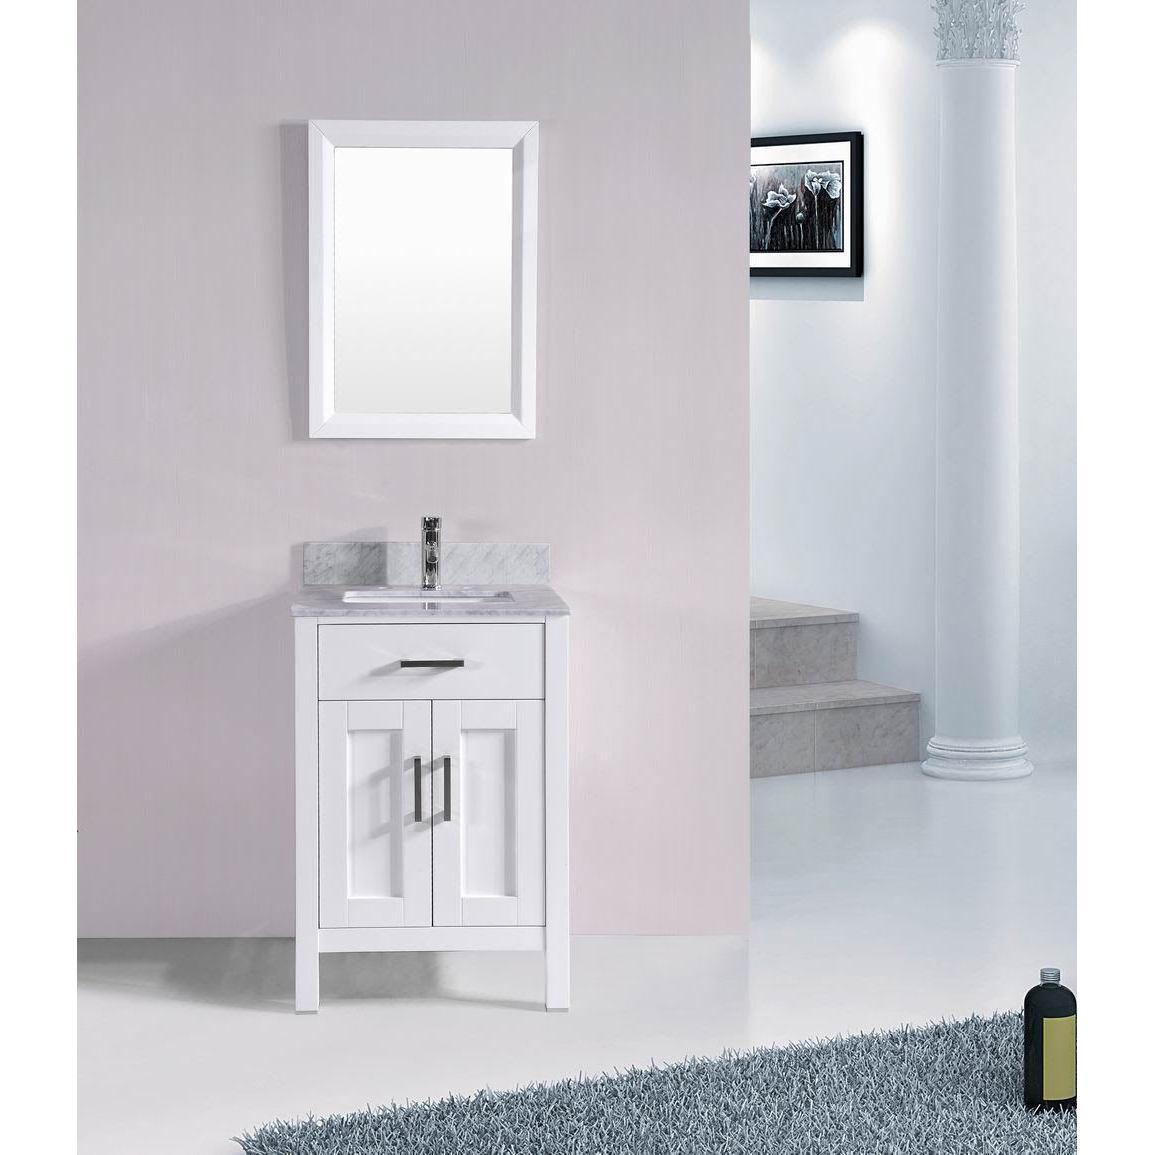 Shop 24-inch Belvedere Bathroom Vanity Set with Marble Top - Free ...